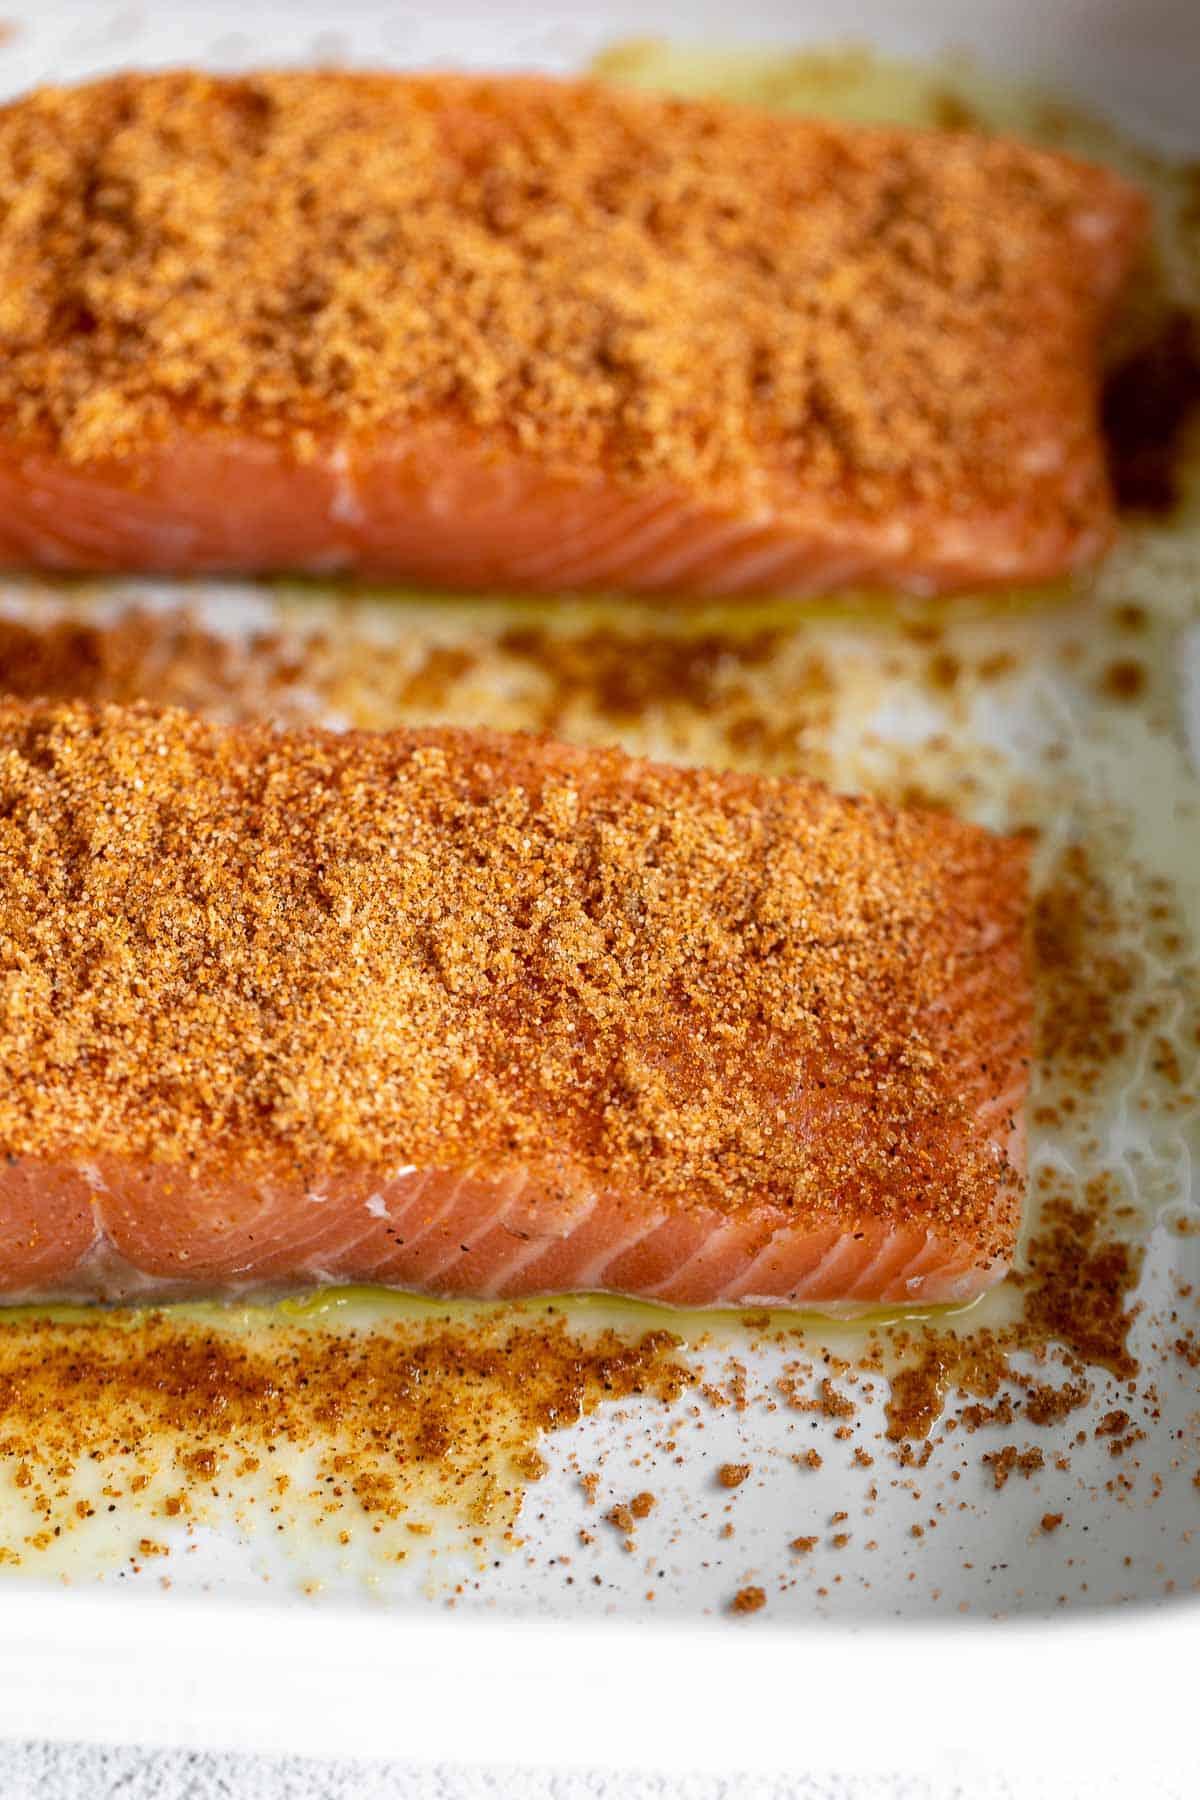 salmon in a baking pan with seasonings before baking